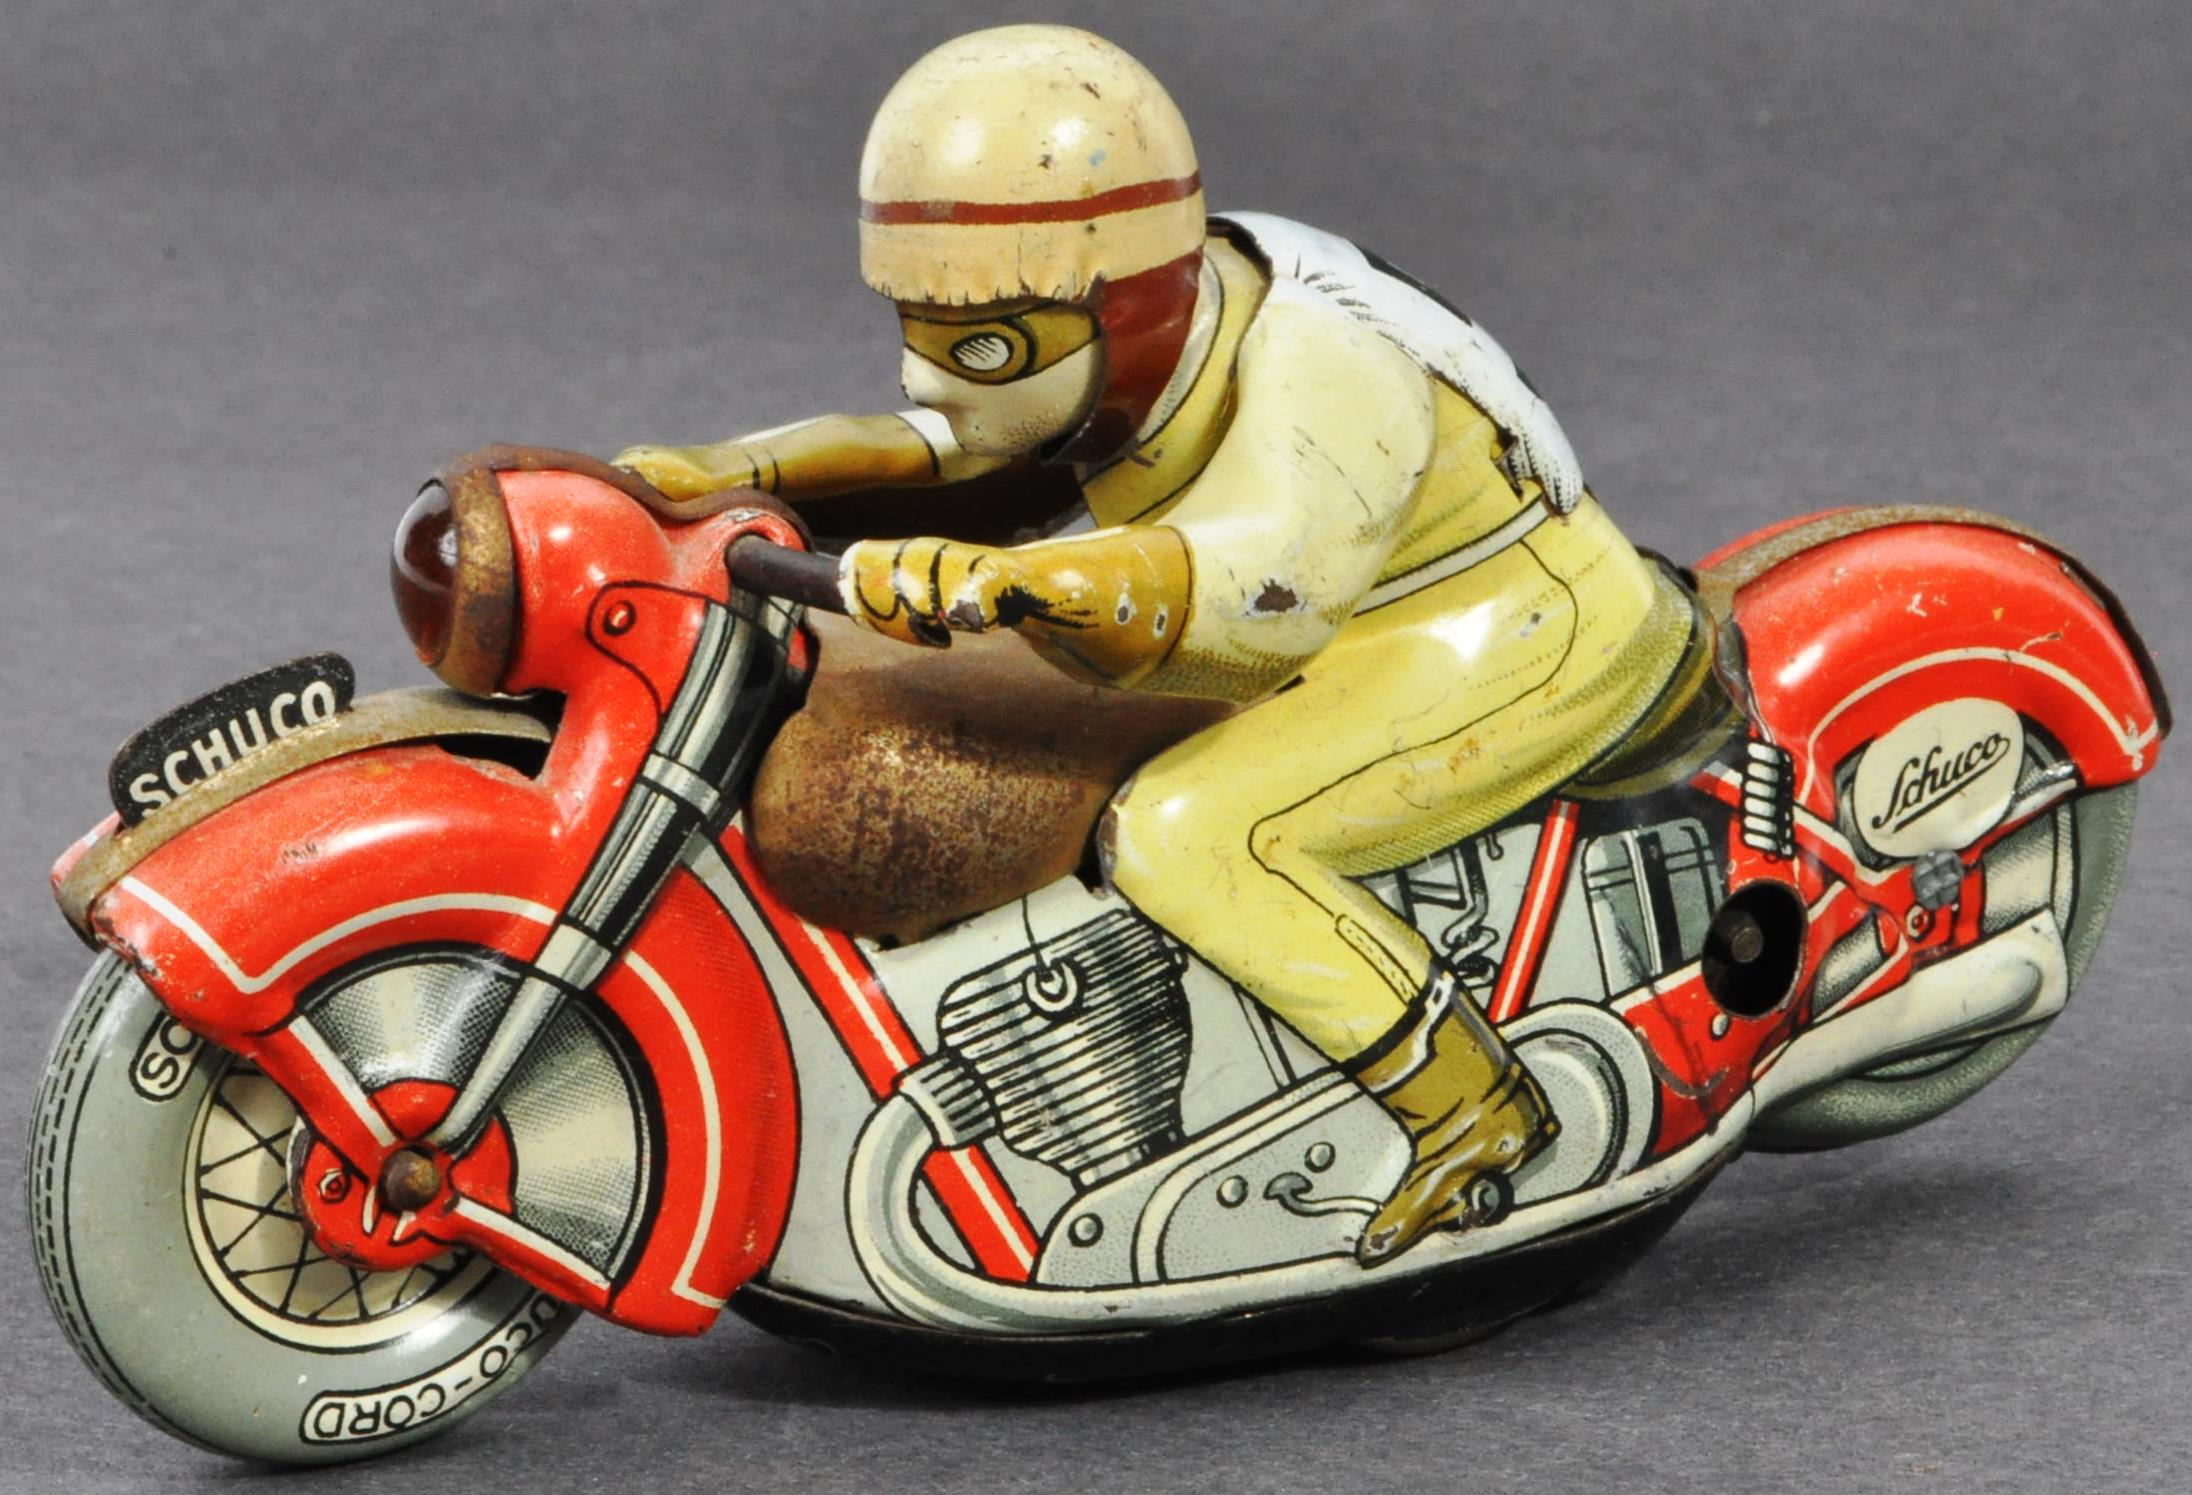 ORIGINAL VINTAGE SCHUCO TINPLATE RACING MOTORCYCLE